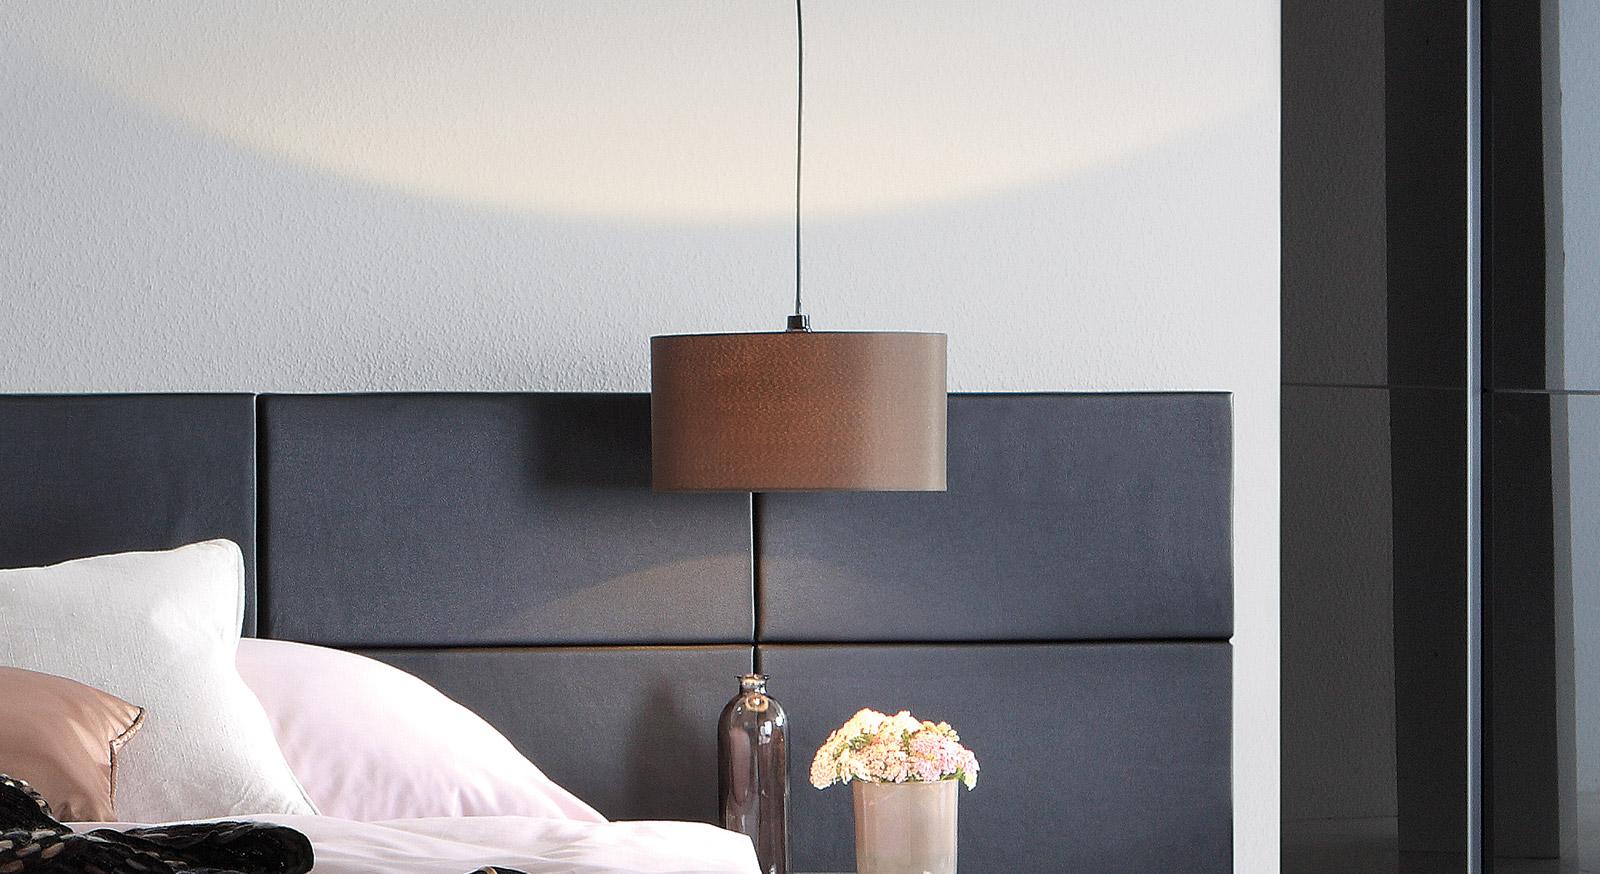 Bett Reno mit dunklem Wand-Paneel